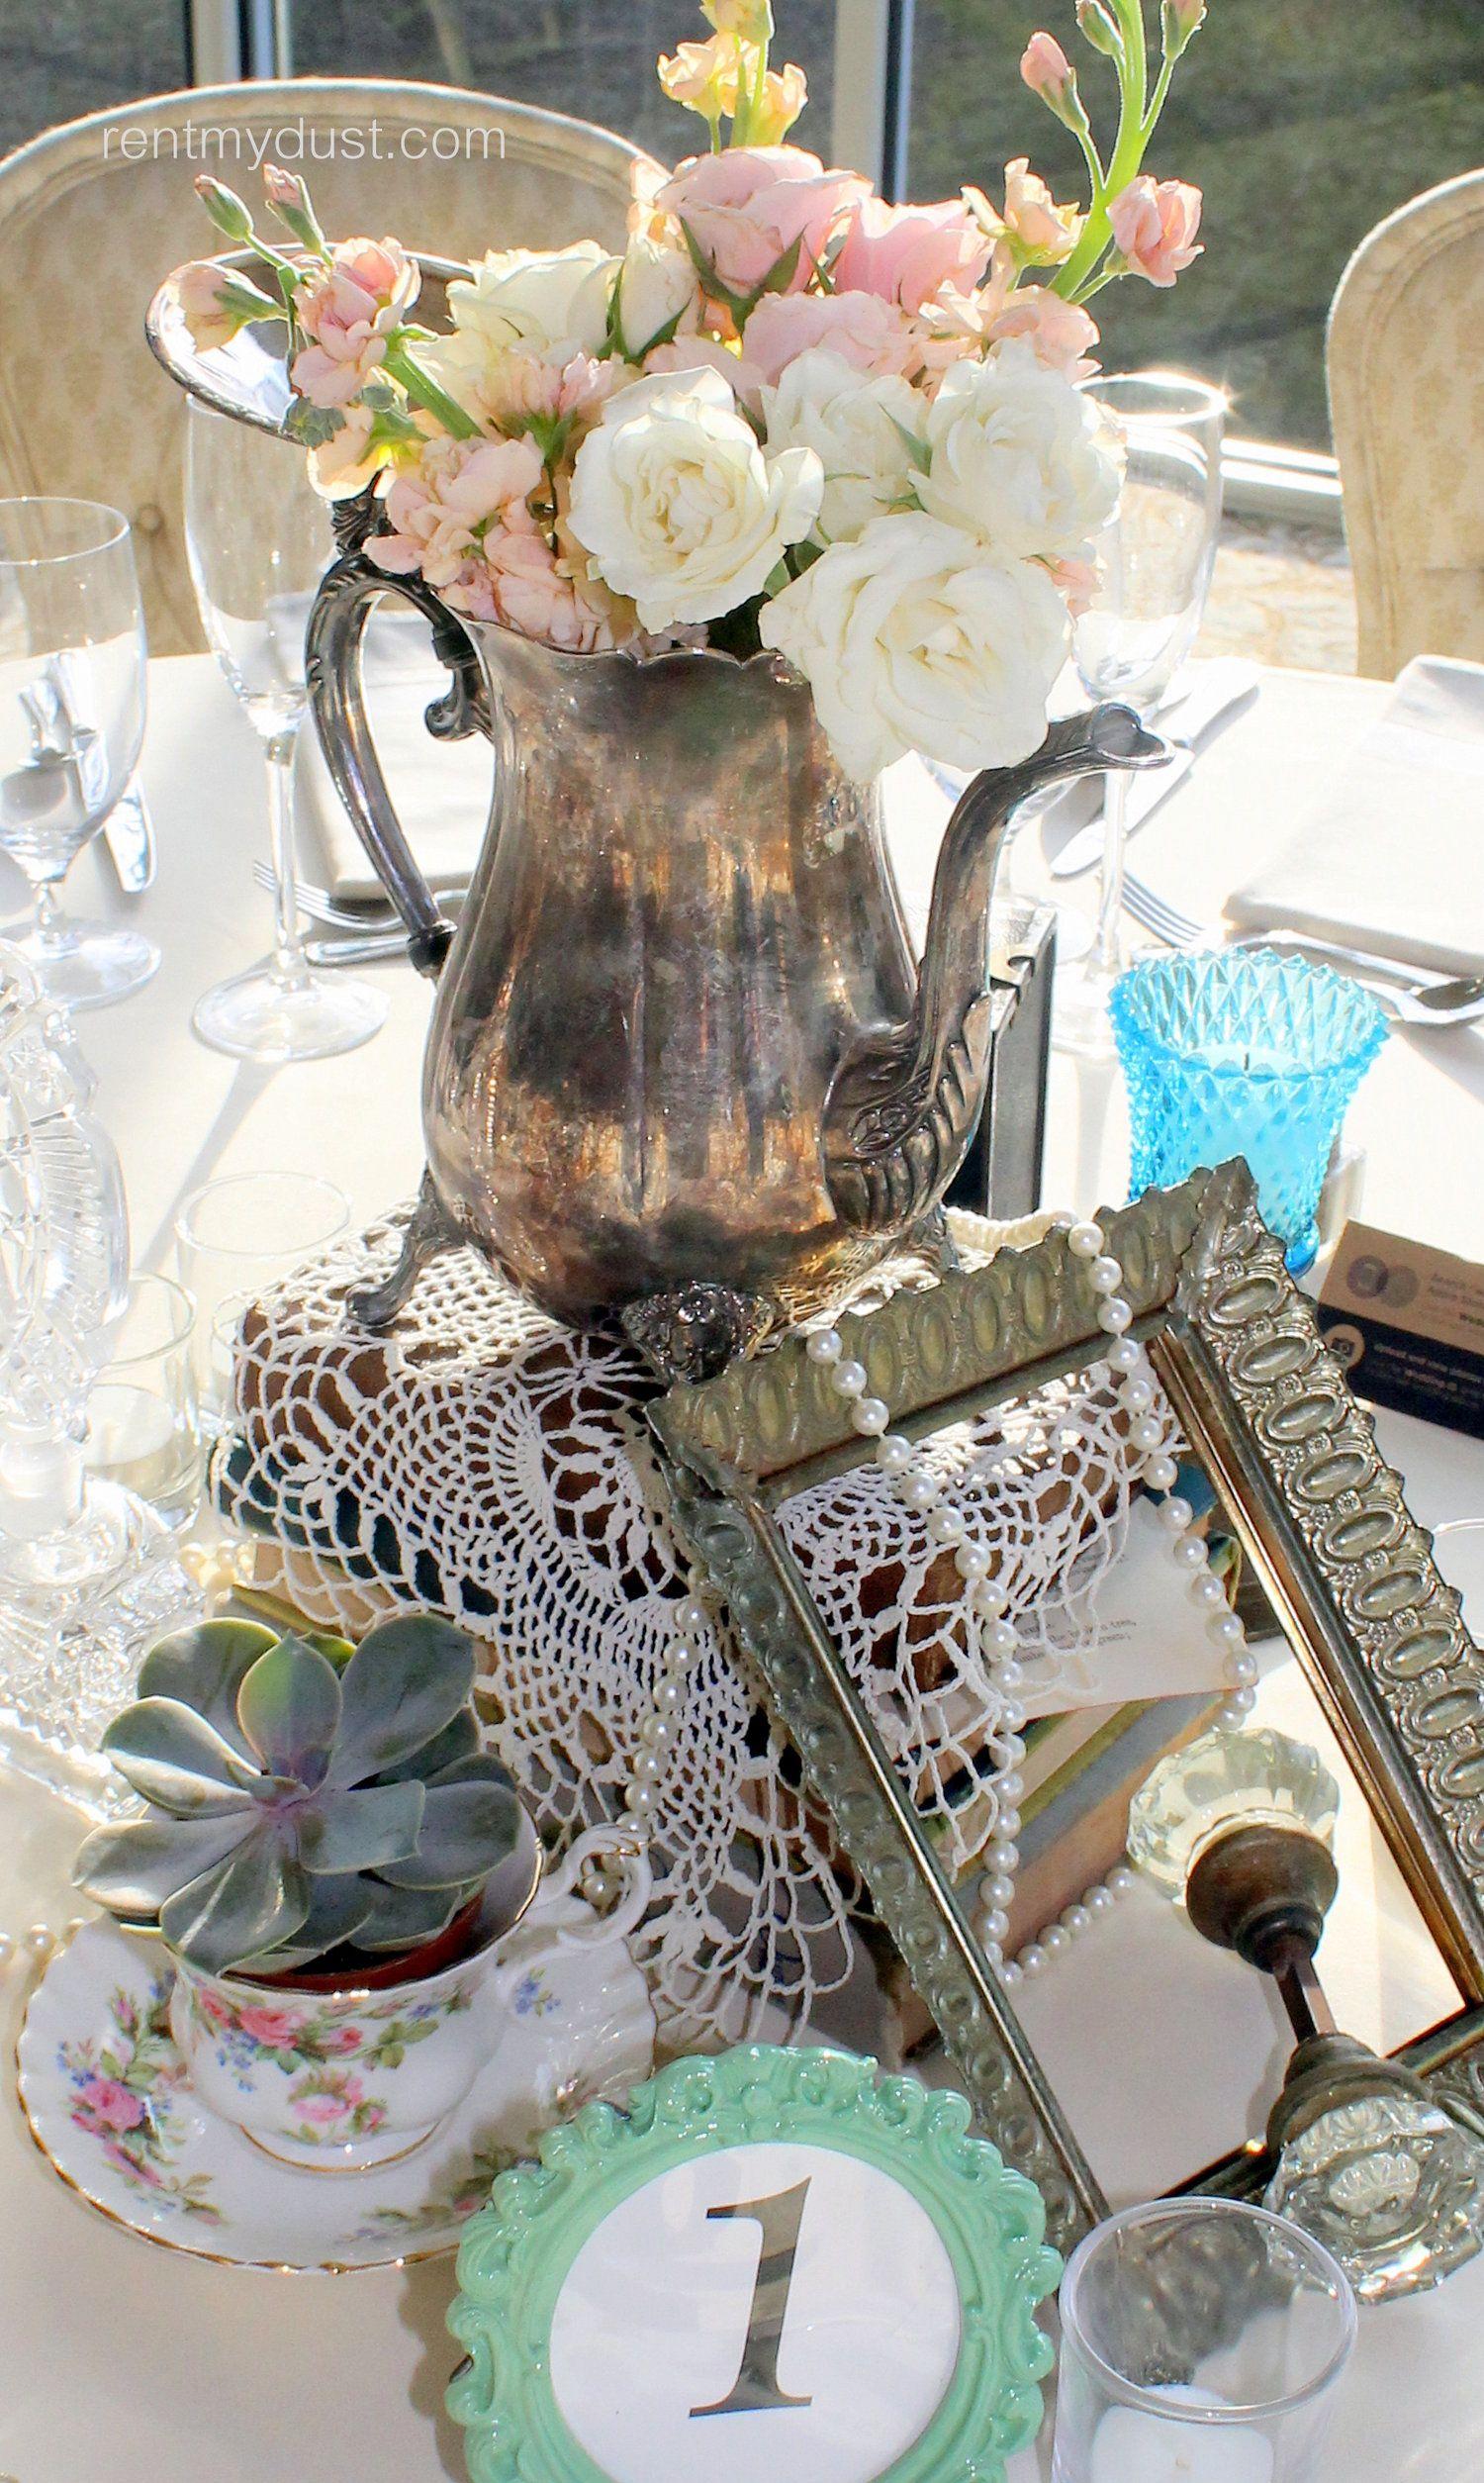 Courtney Bradford Elegant Vintage Wedding At Ashton Garden Rent My Dust Vintage Wedding Table Wedding Table Decorations Vintage Vintage Wedding Table Settings